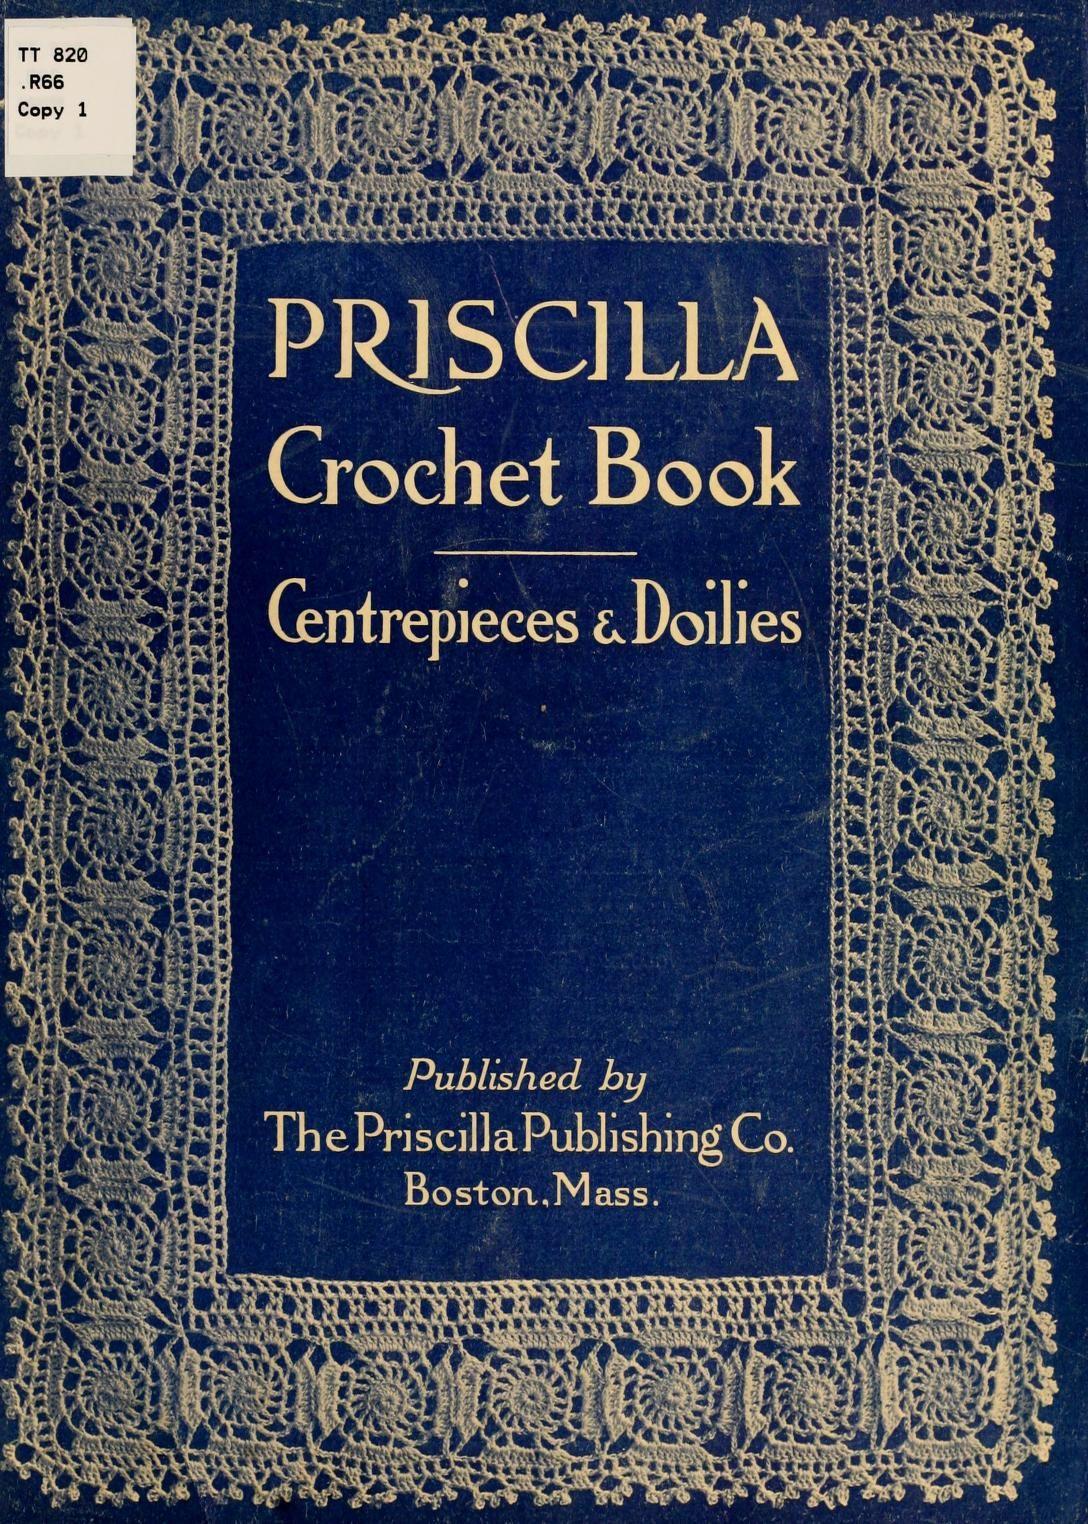 The Priscilla crochet book, centerpieces and do...  https://archive.org/stream/priscillacrochet01robi